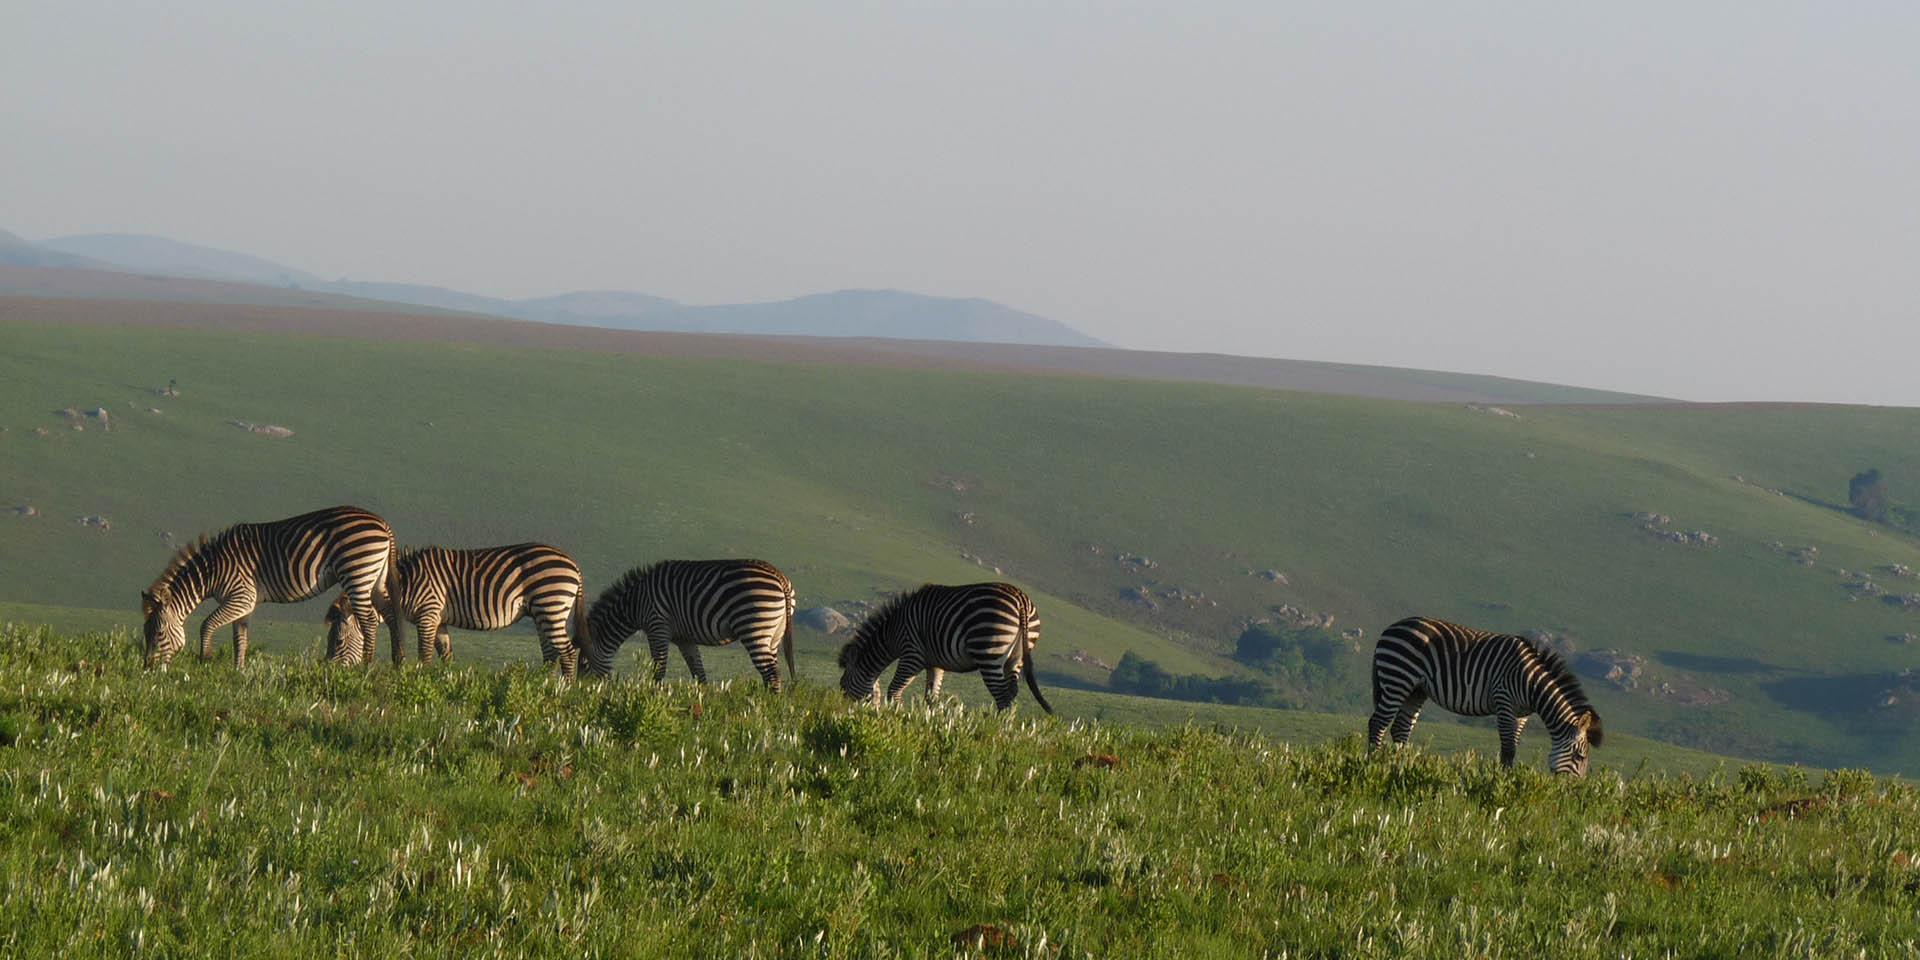 northern-explorer-7-nights-bush-beach-safaris-tours-malawian-style-malawi-adventures-experiences-specialist-tour-operator-zebra-nyika